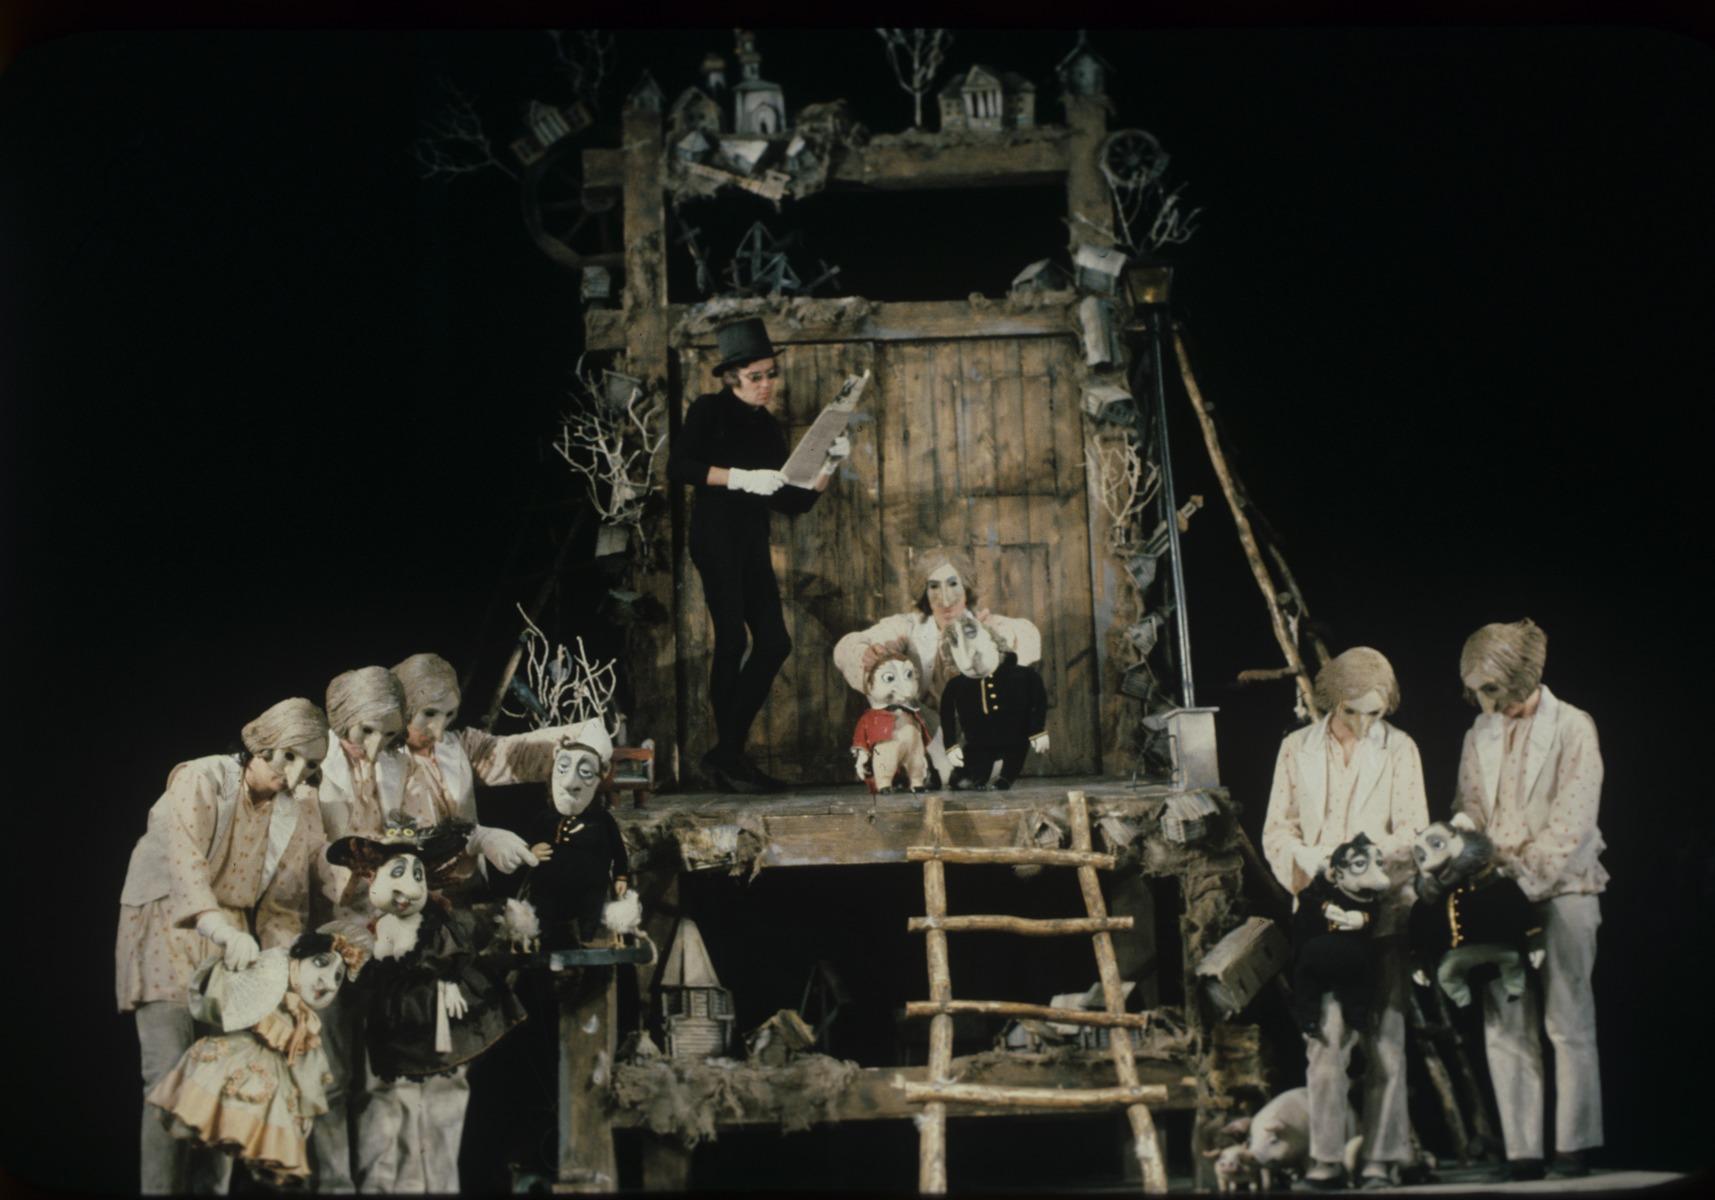 <em>Mertviye dushi</em> (Les Âmes mortes, 1983), d'après le roman de Nicolaï Gogol, par le Chelyabinskiy teatr kukol (Chelyabinsk, Russie), mise en scène : Valeri Volkhovski, scénographie: Elena Loutsenko. Photo: Alexander Lyskin